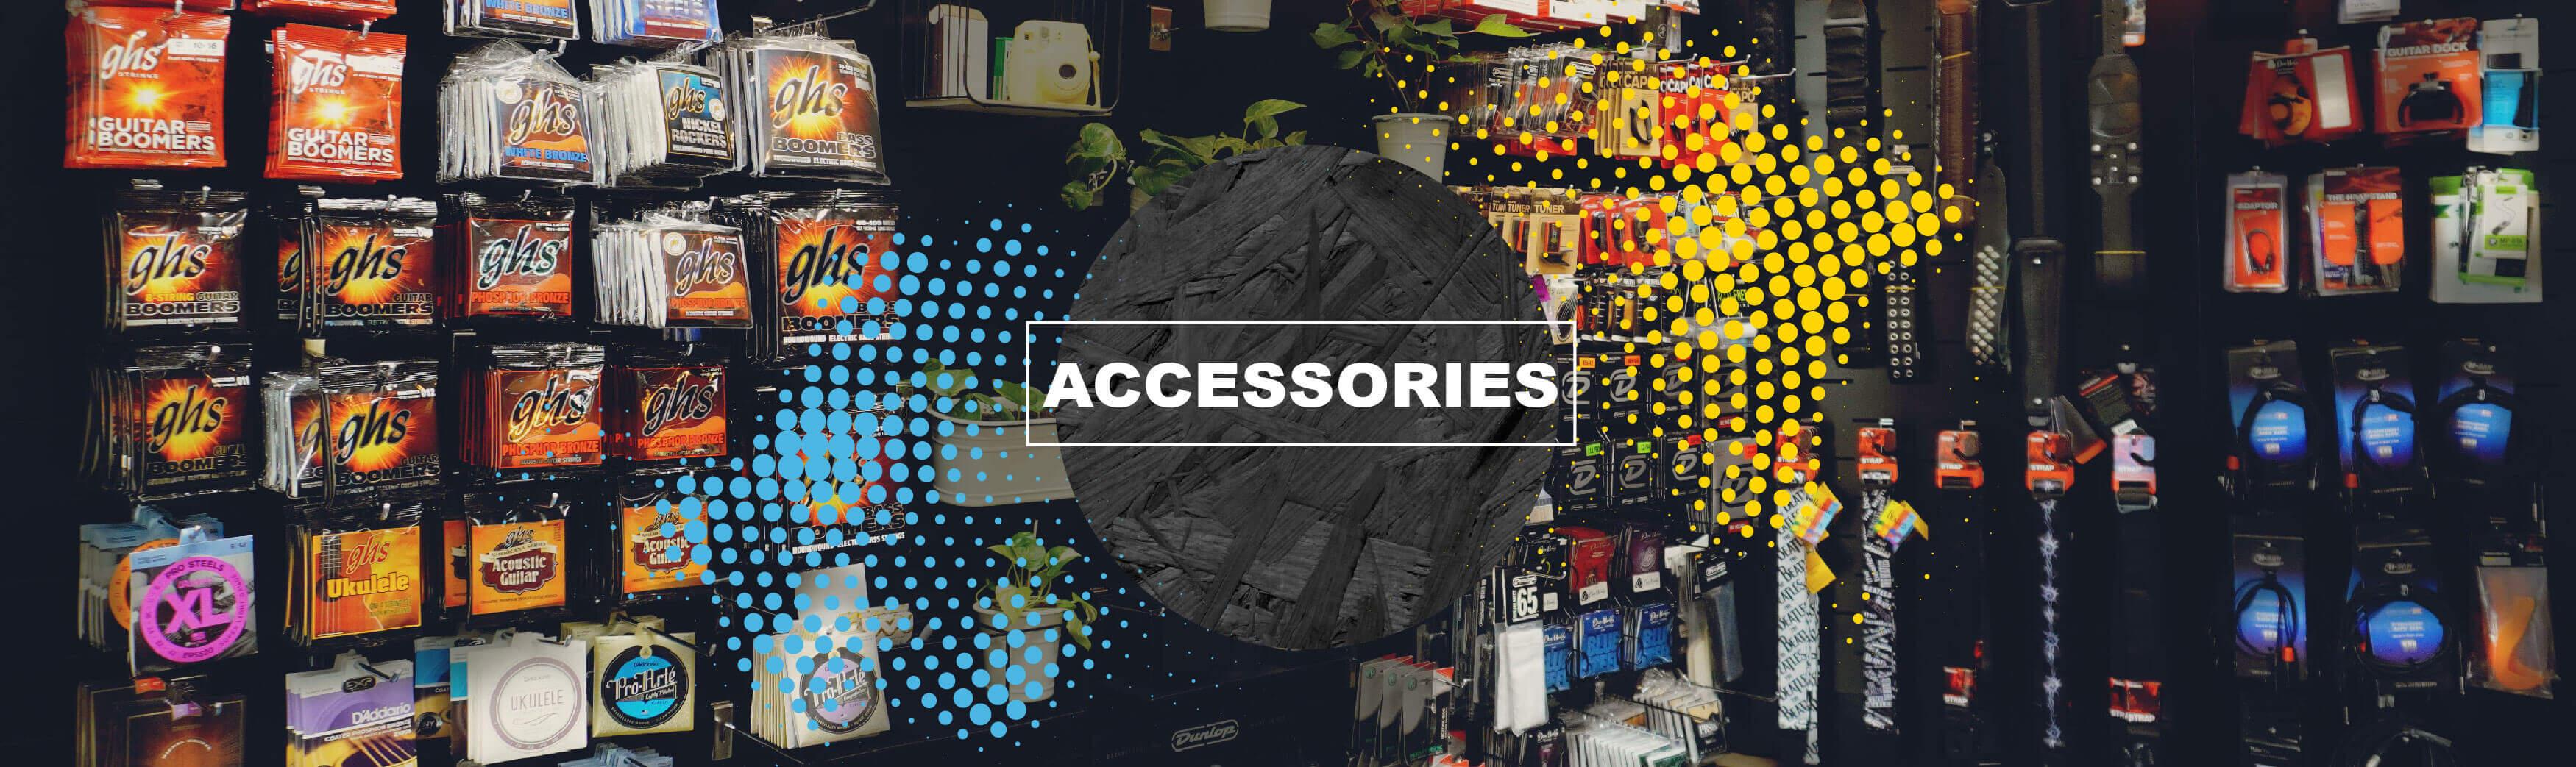 Accessories for music   Melody House UAE Dubai